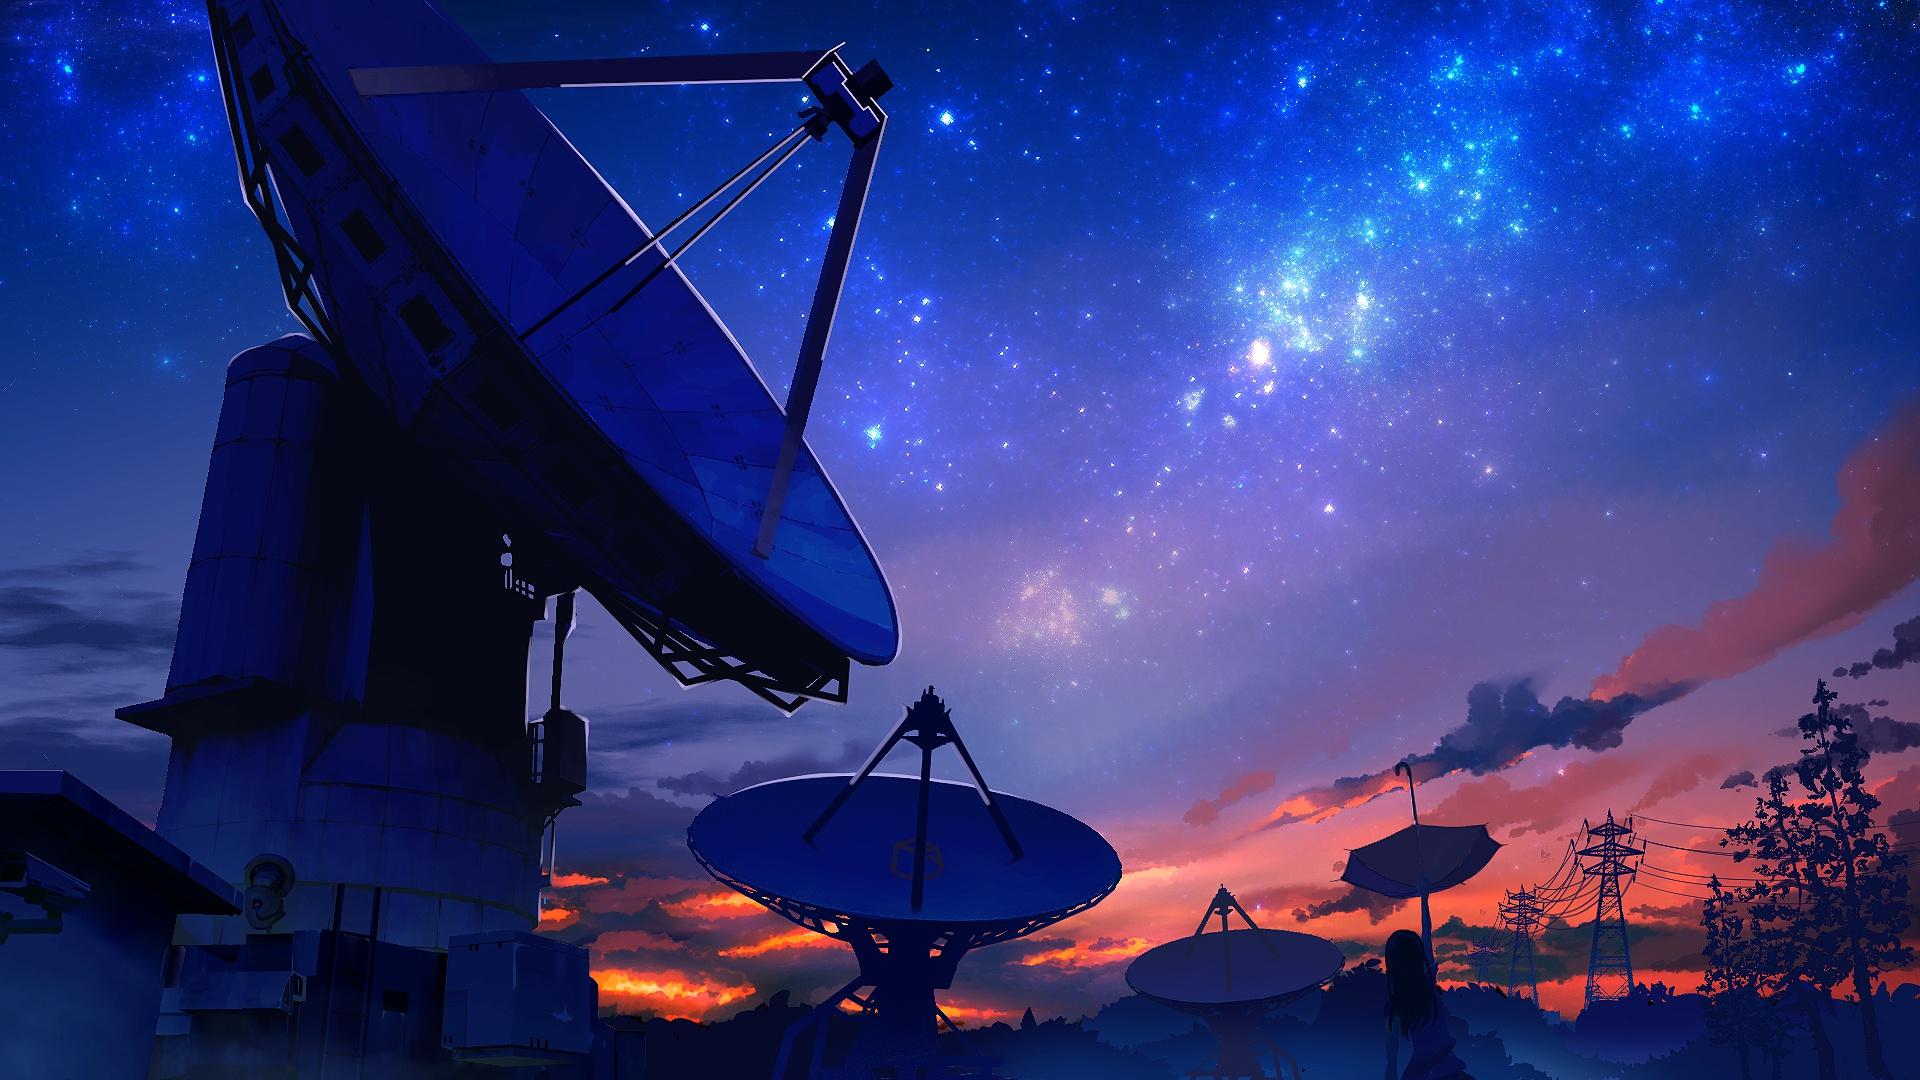 General 1920x1080 radio telescope space technology sky night sky artwork blue stars anime girls sunset